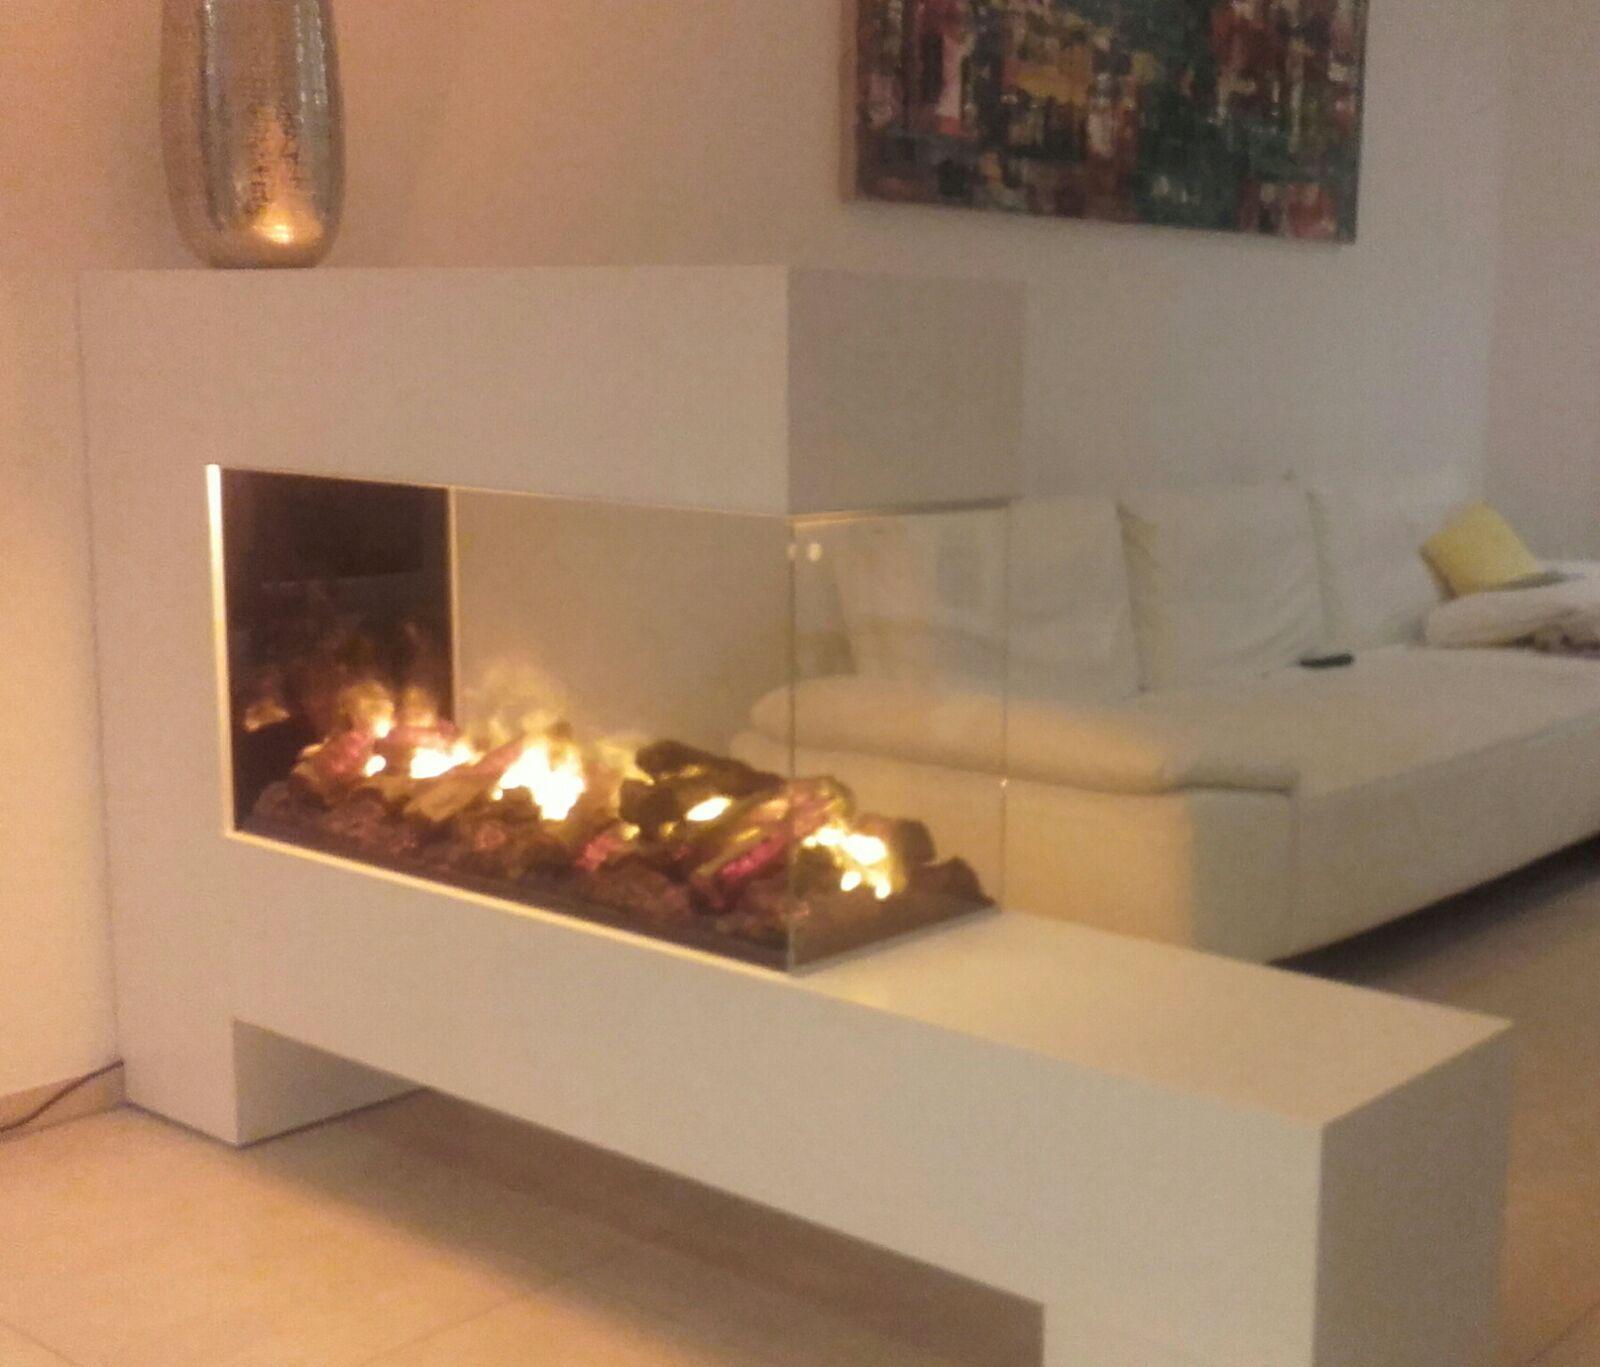 kamagra sicher bestellen. Black Bedroom Furniture Sets. Home Design Ideas